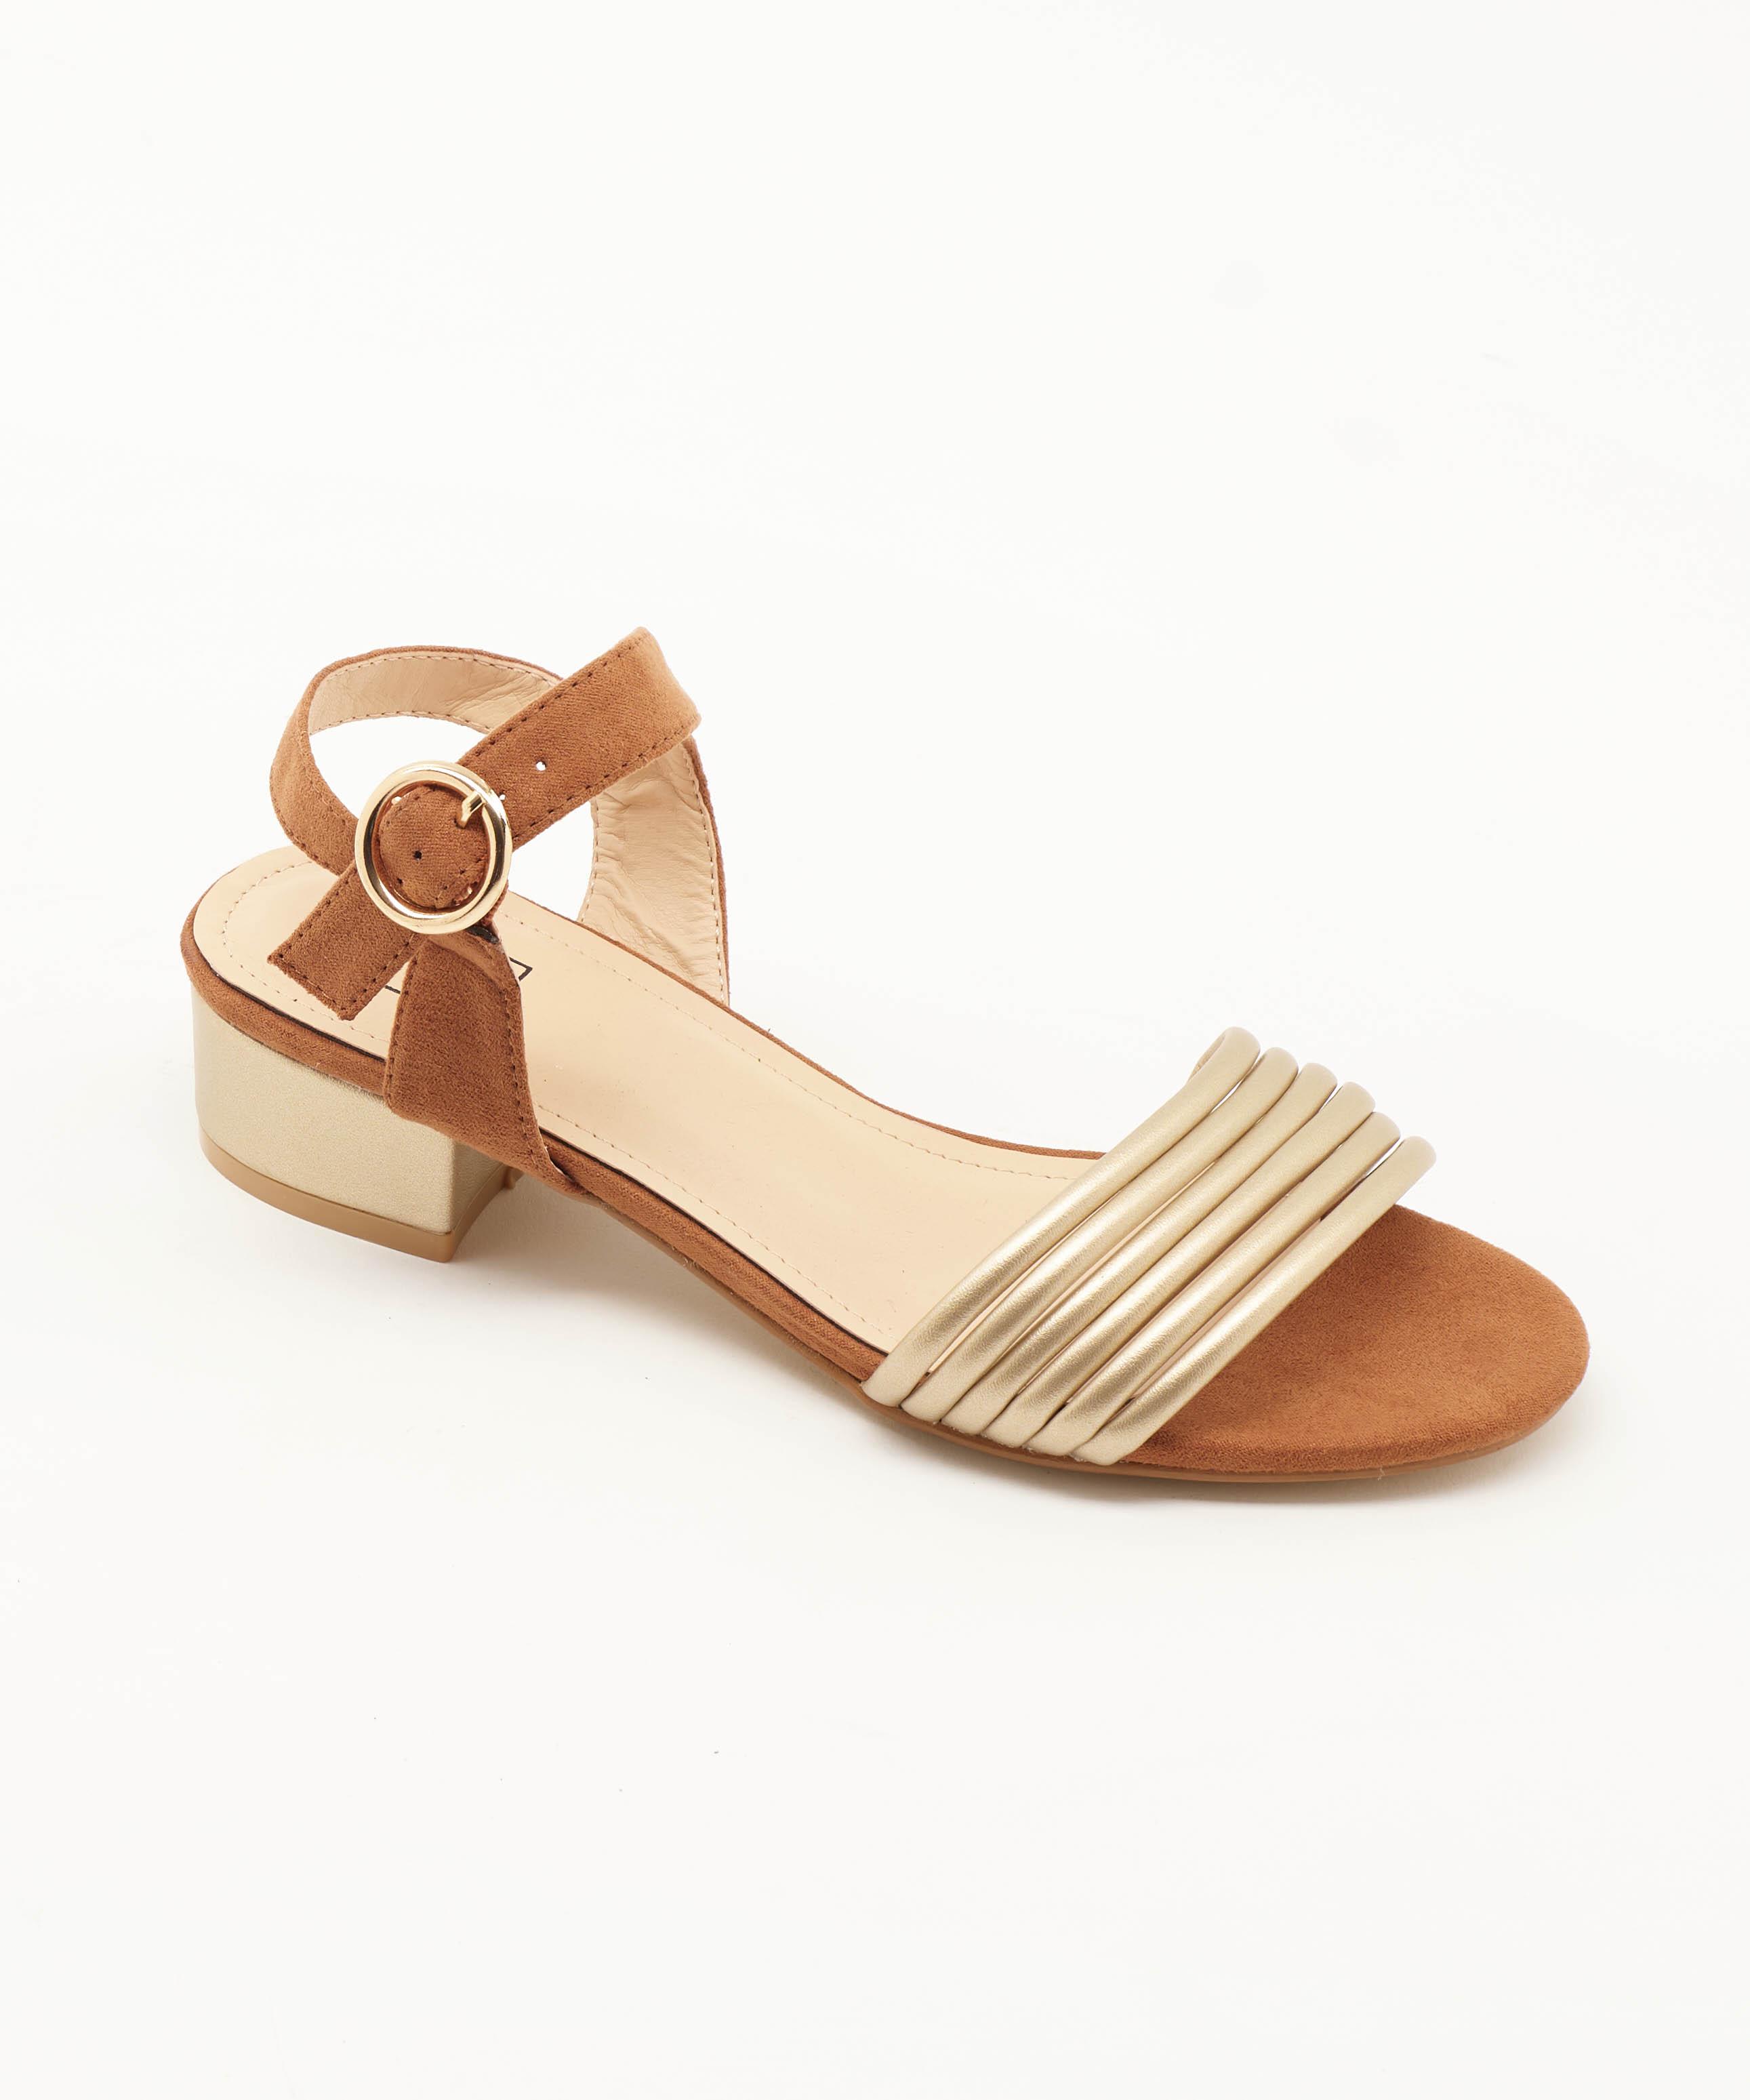 Sandales À Talons Femme - Sandale Talon Decrochee Camel Jina - Lj603-6a